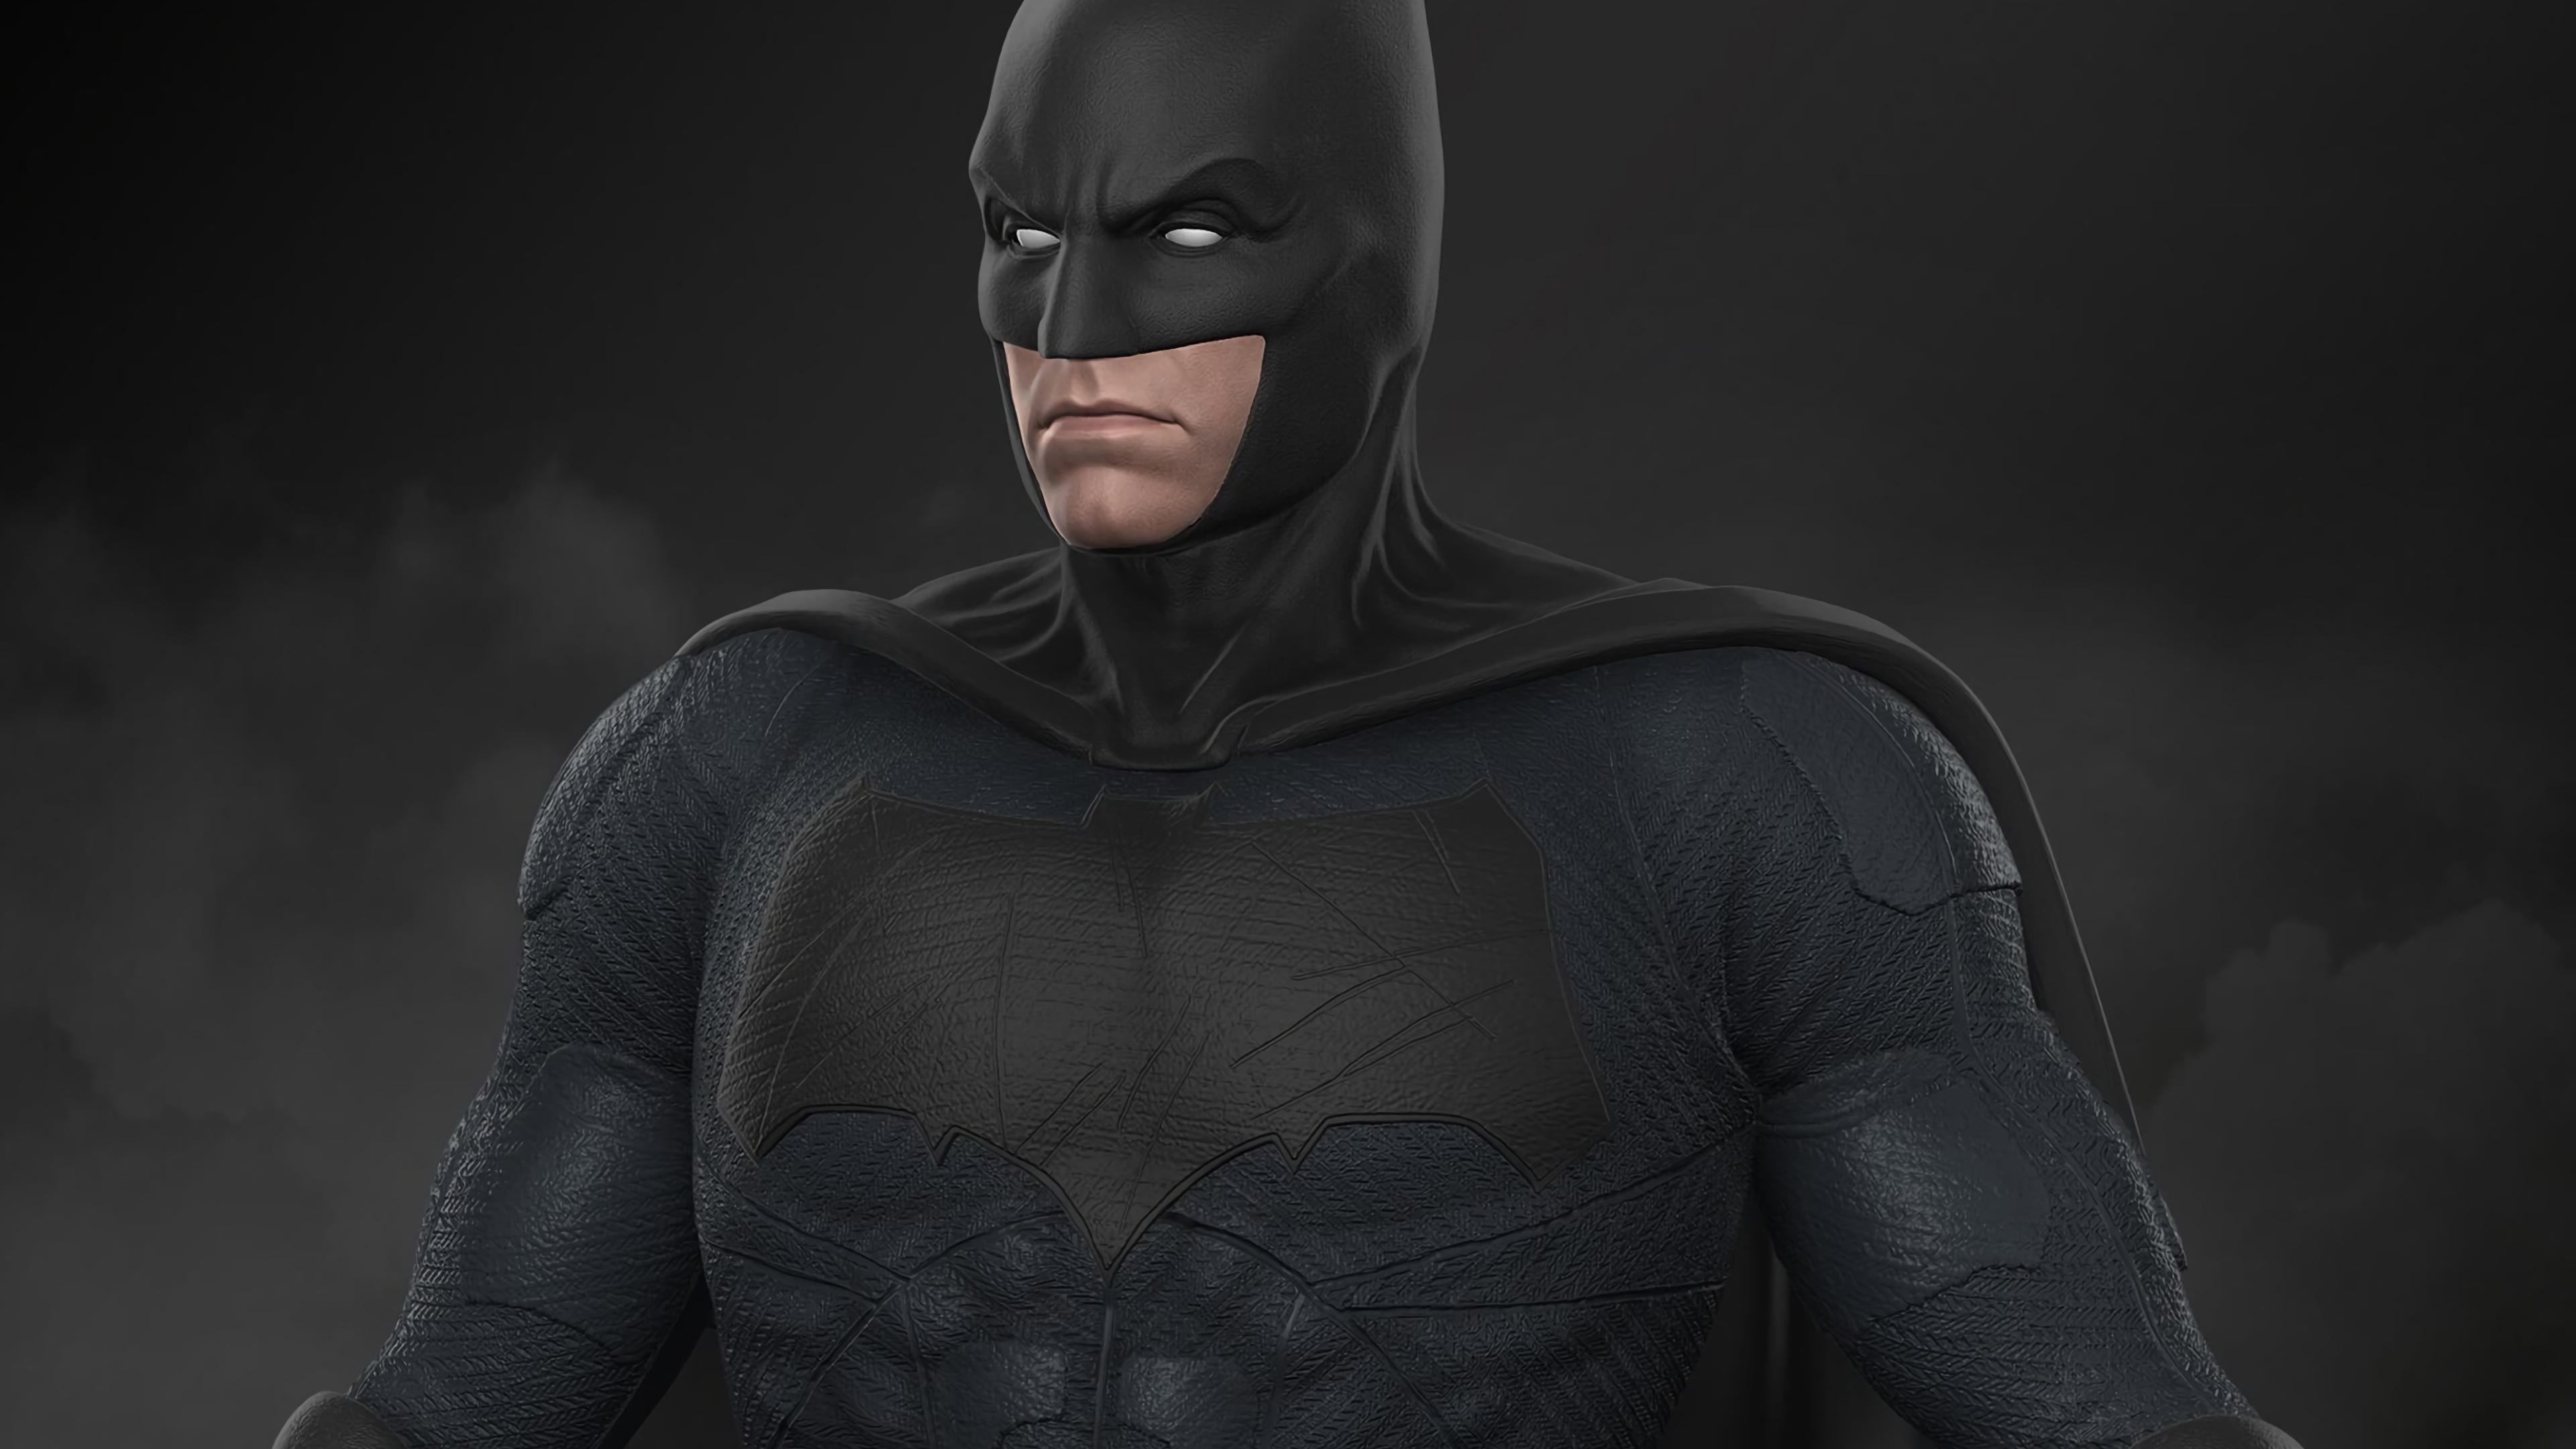 batman art 1568054590 - Batman Art - superheroes wallpapers, hd-wallpapers, digital art wallpapers, batman wallpapers, artwork wallpapers, artstation wallpapers, 4k-wallpapers